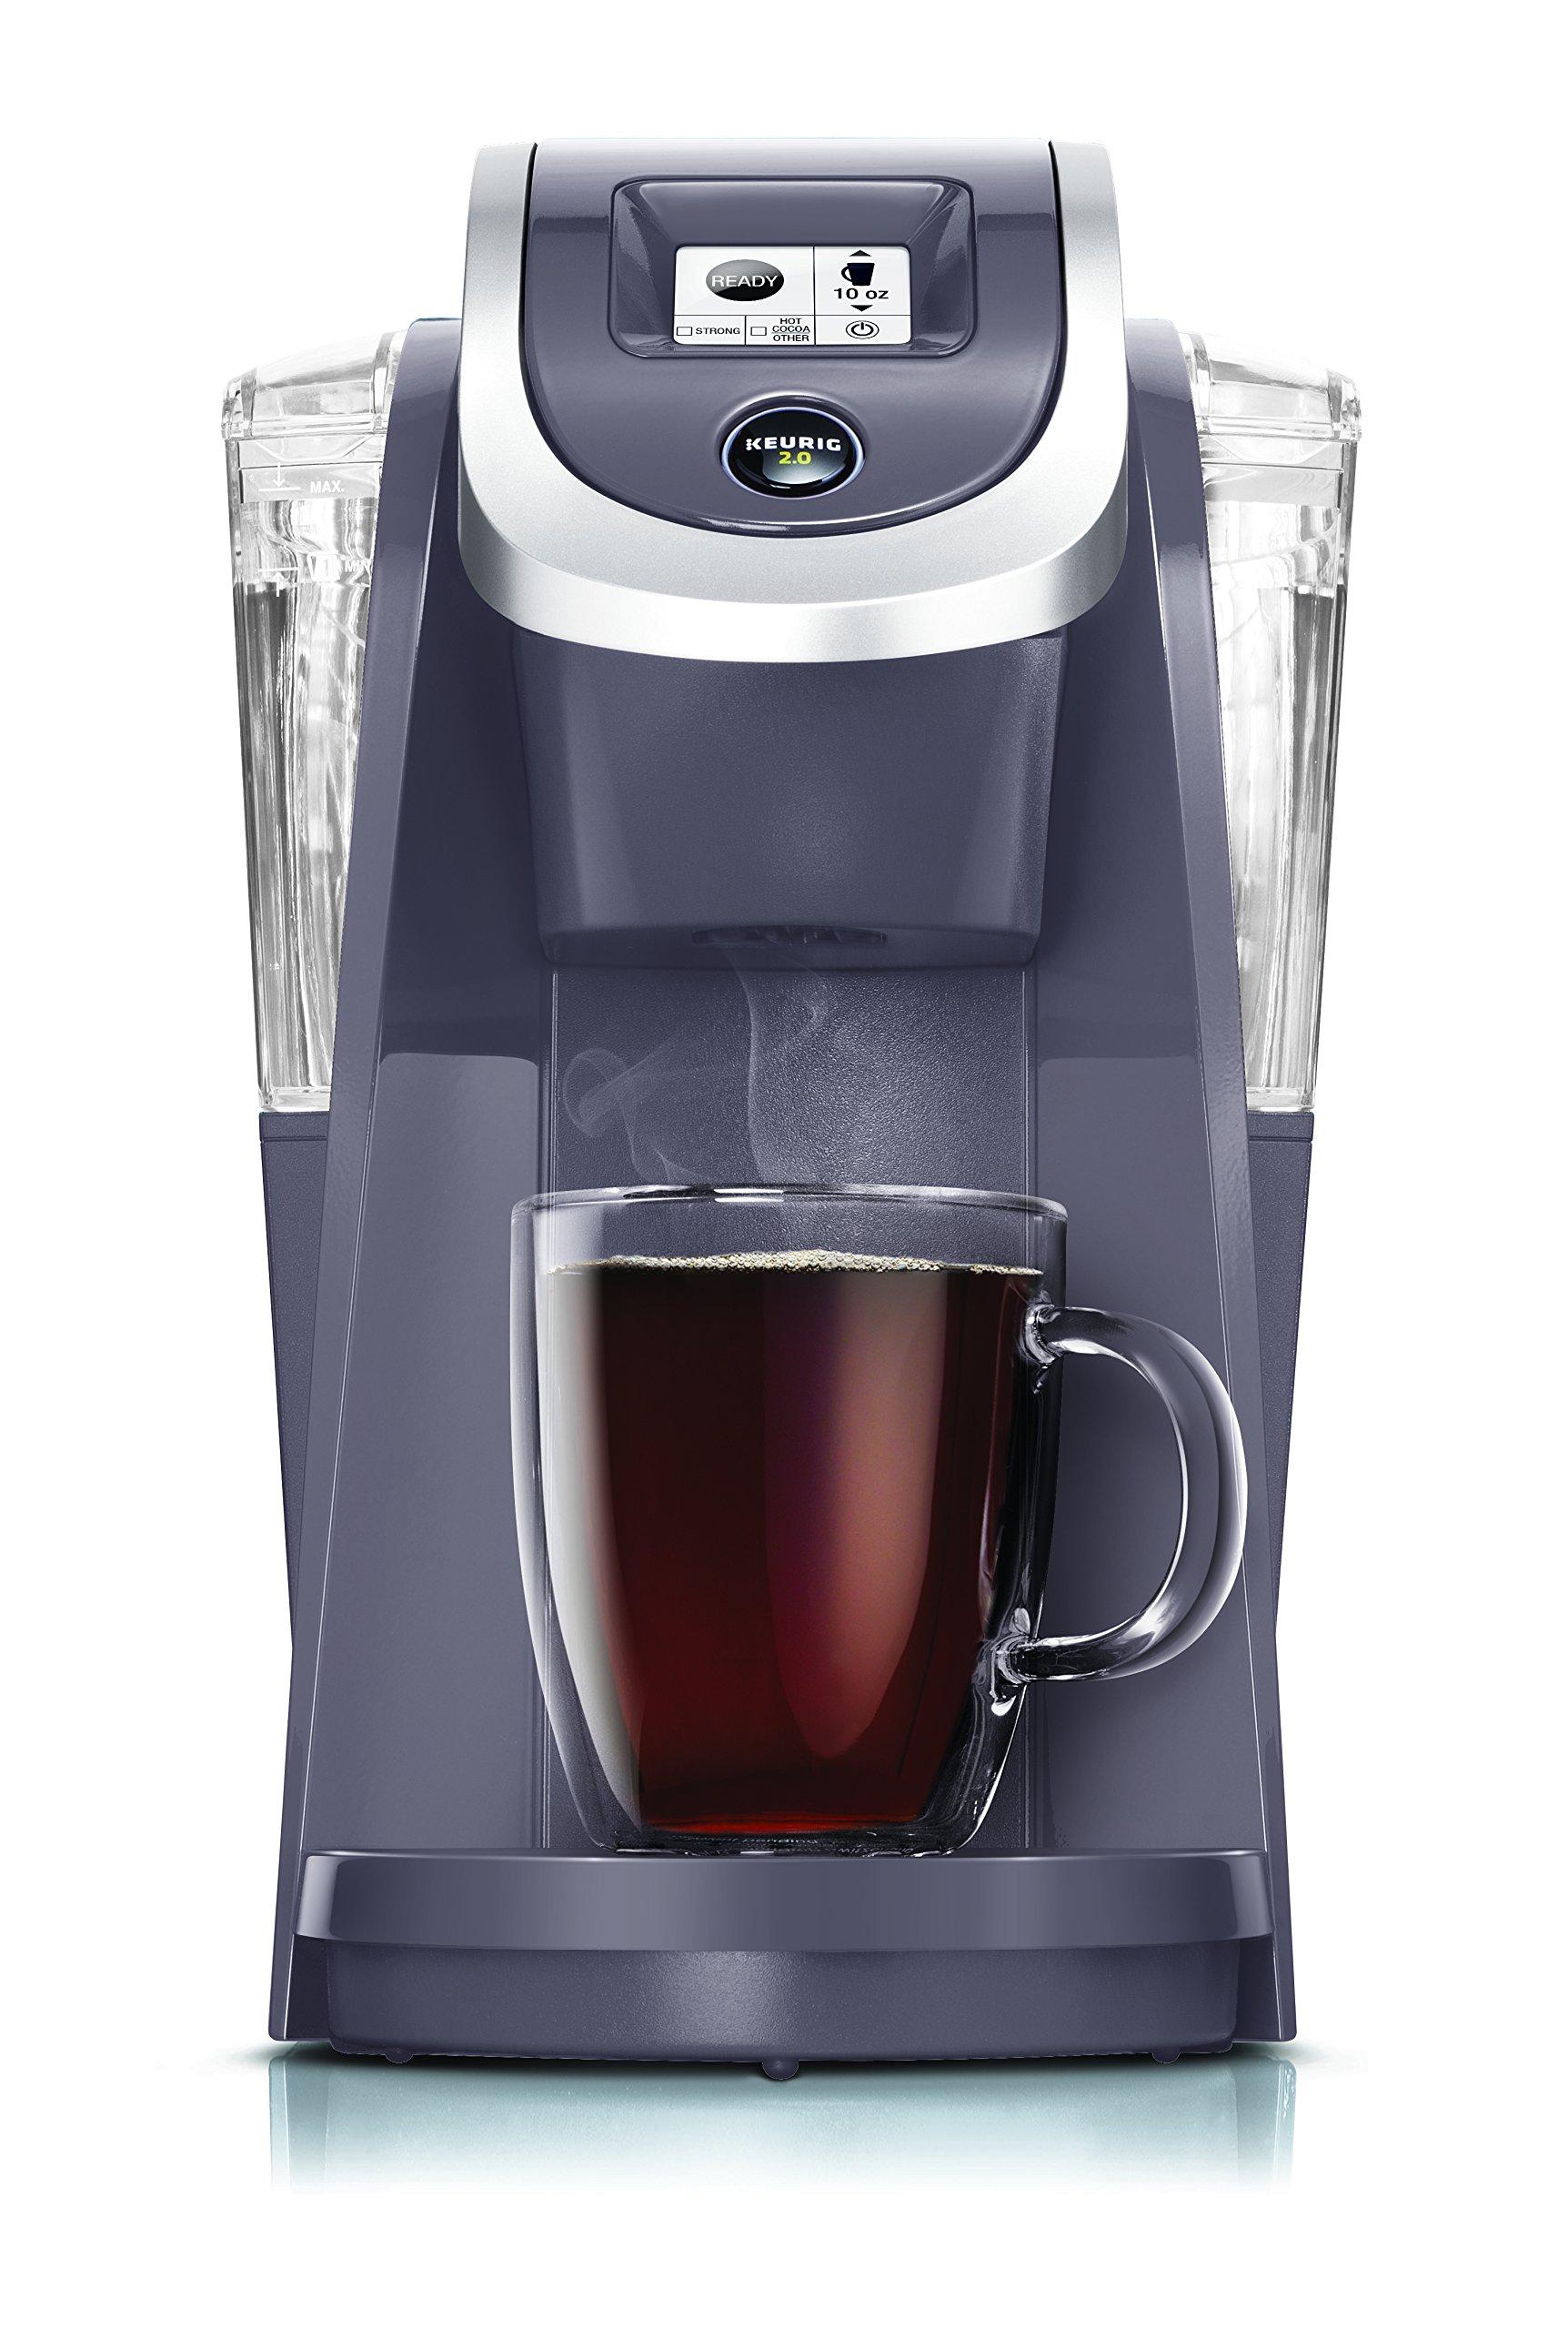 Keurig K250 Single Serve K-Cup Pod Coffee Maker with Strength Control Plum Grey Plum Grey by Keurig (Image #1)